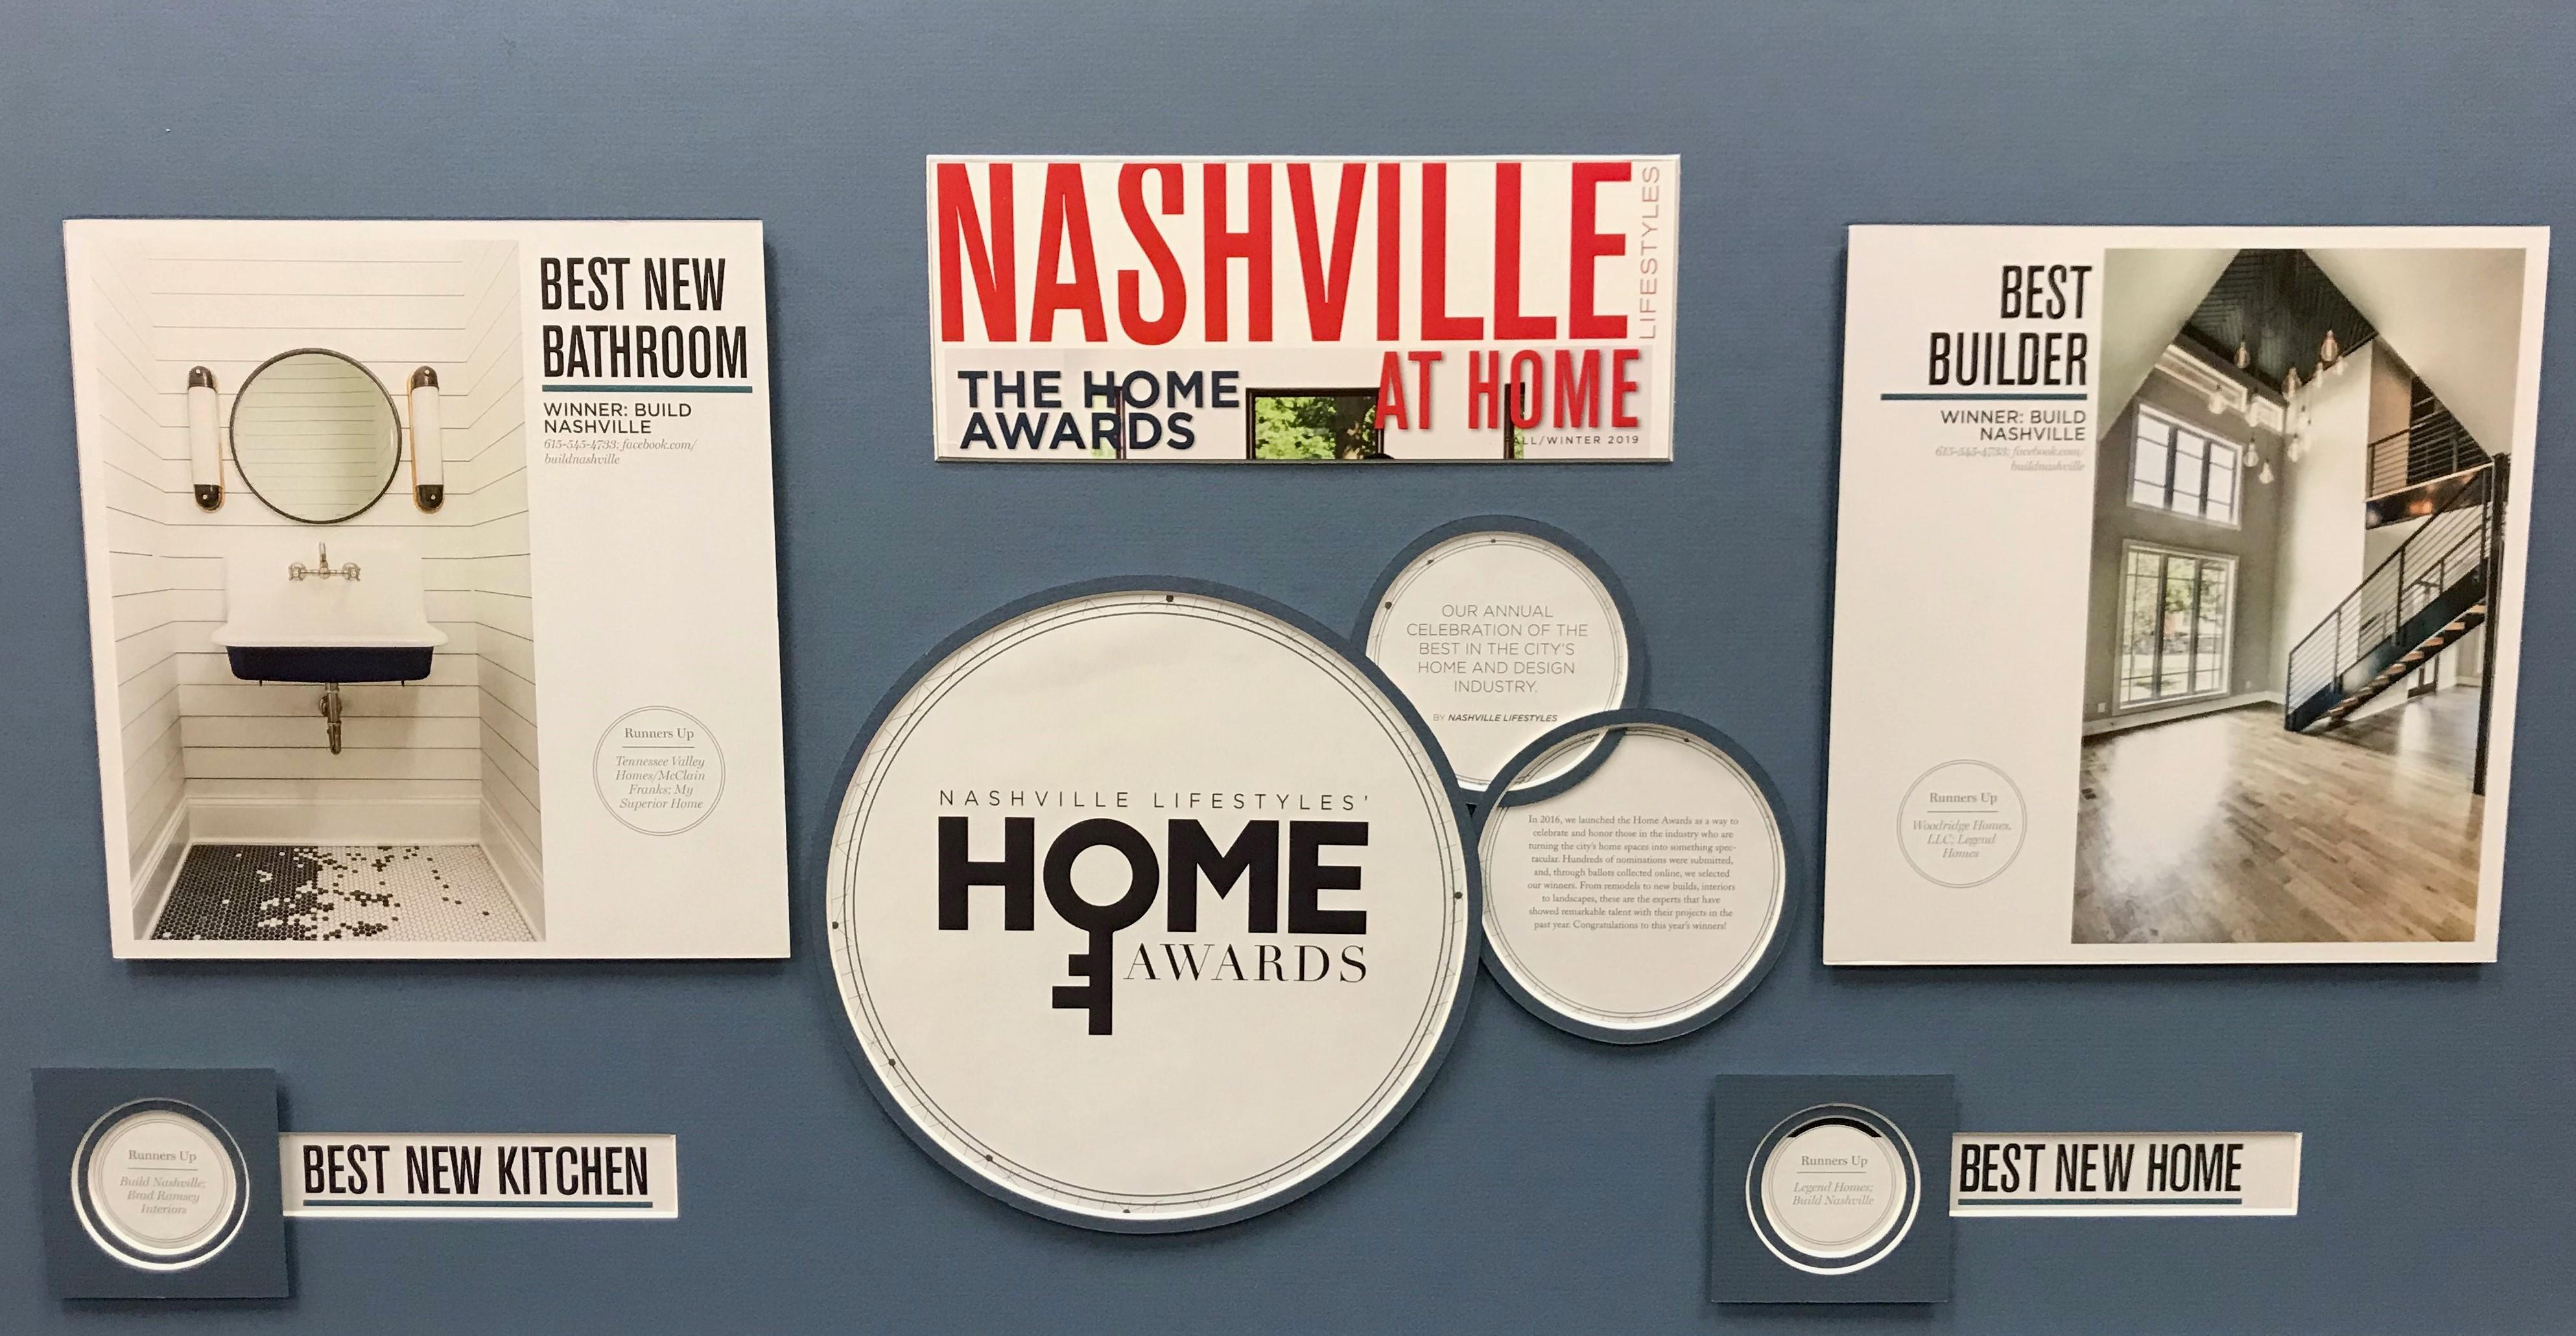 nashville-at-home-magazine.jpg